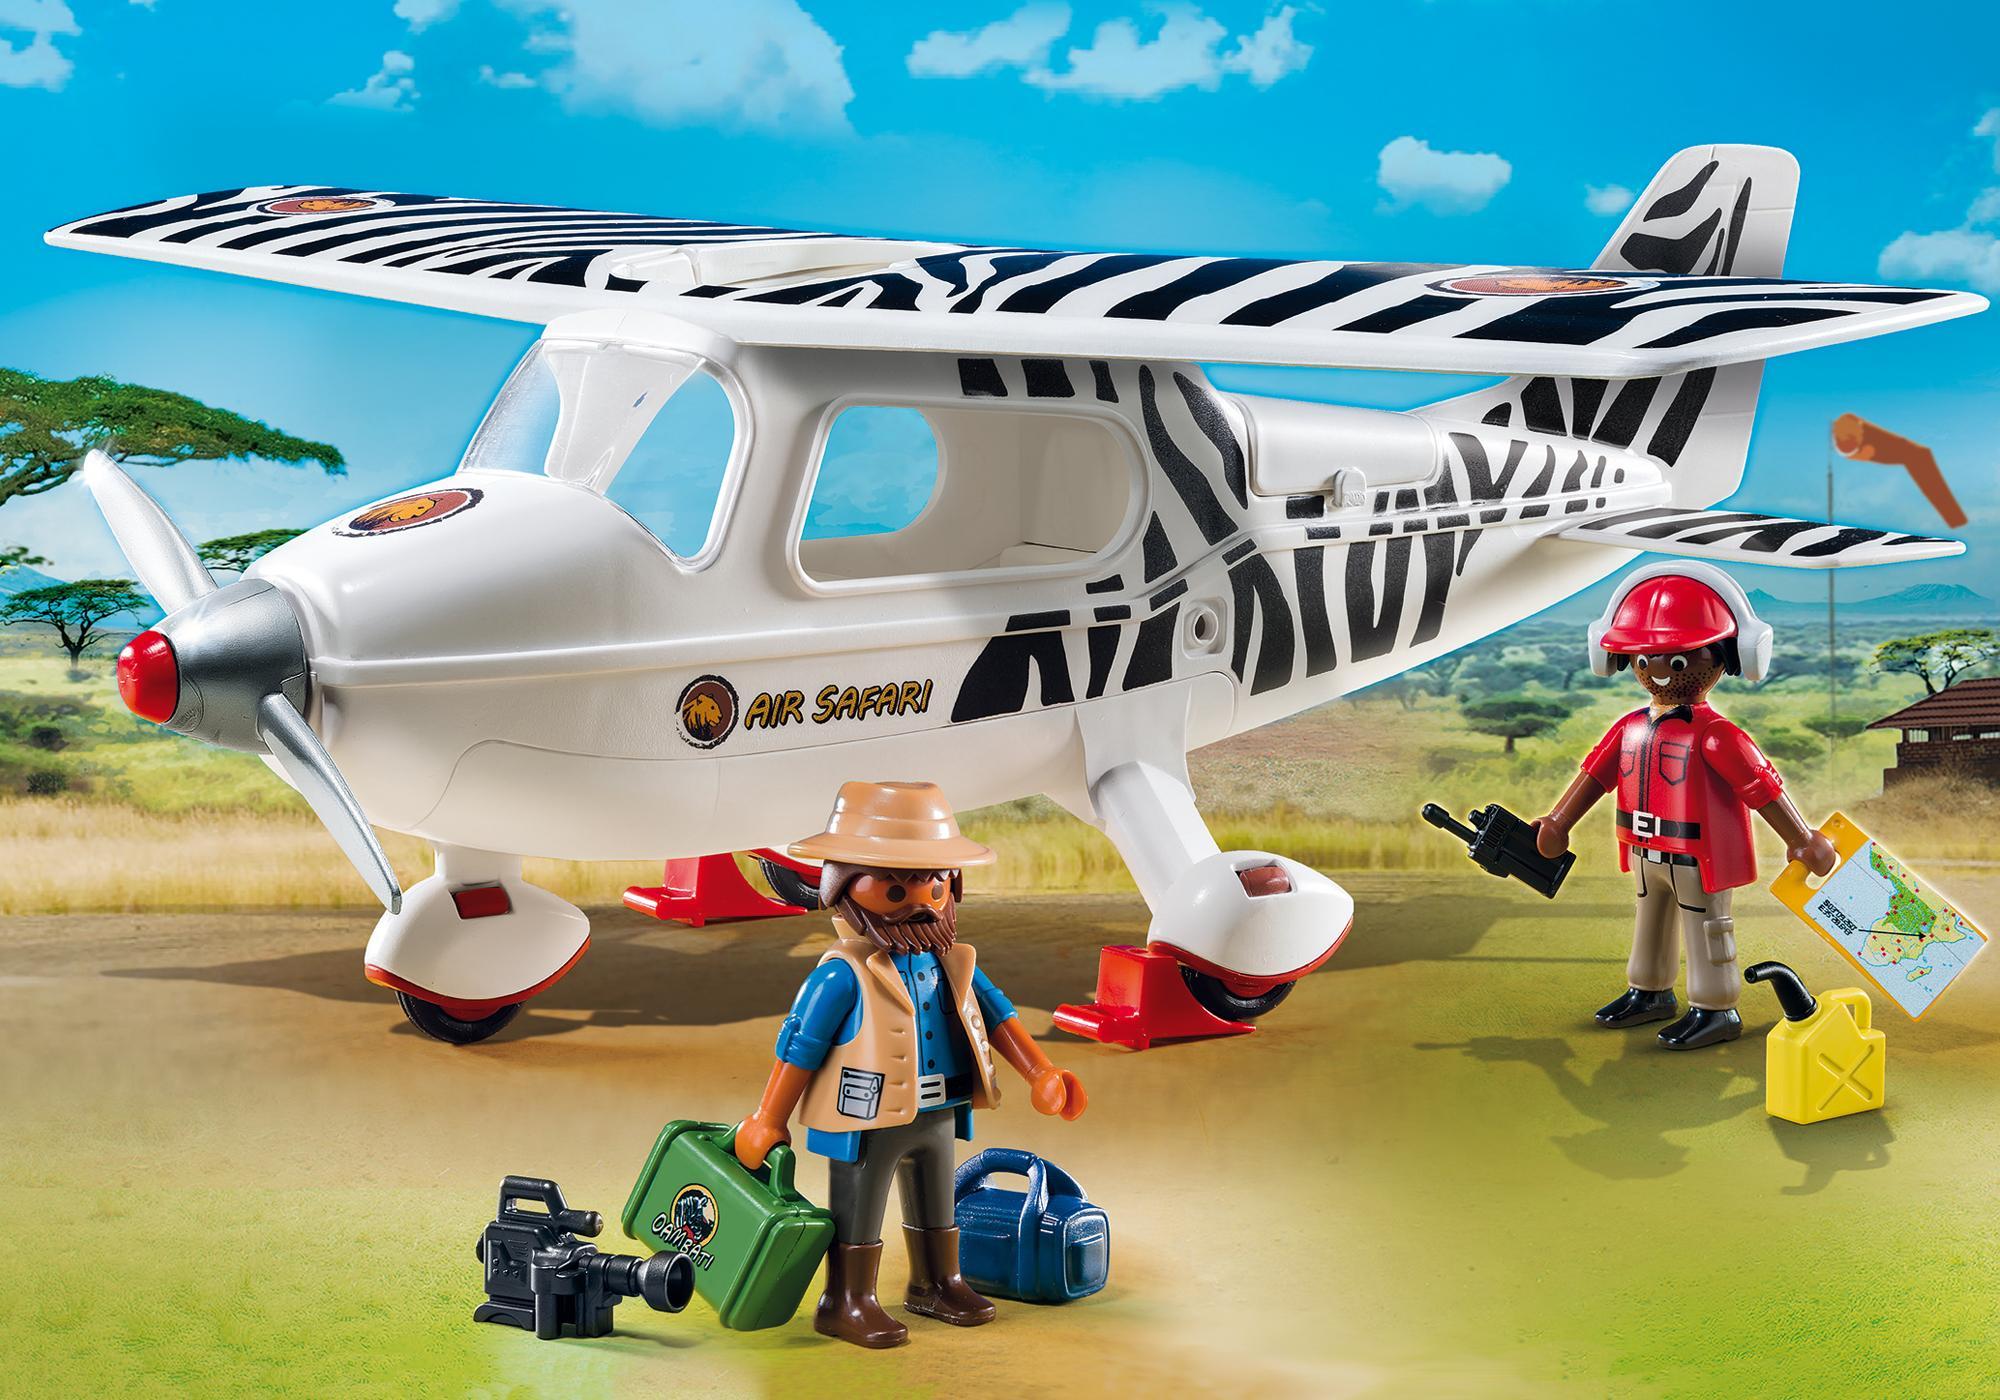 http://media.playmobil.com/i/playmobil/6938_product_detail